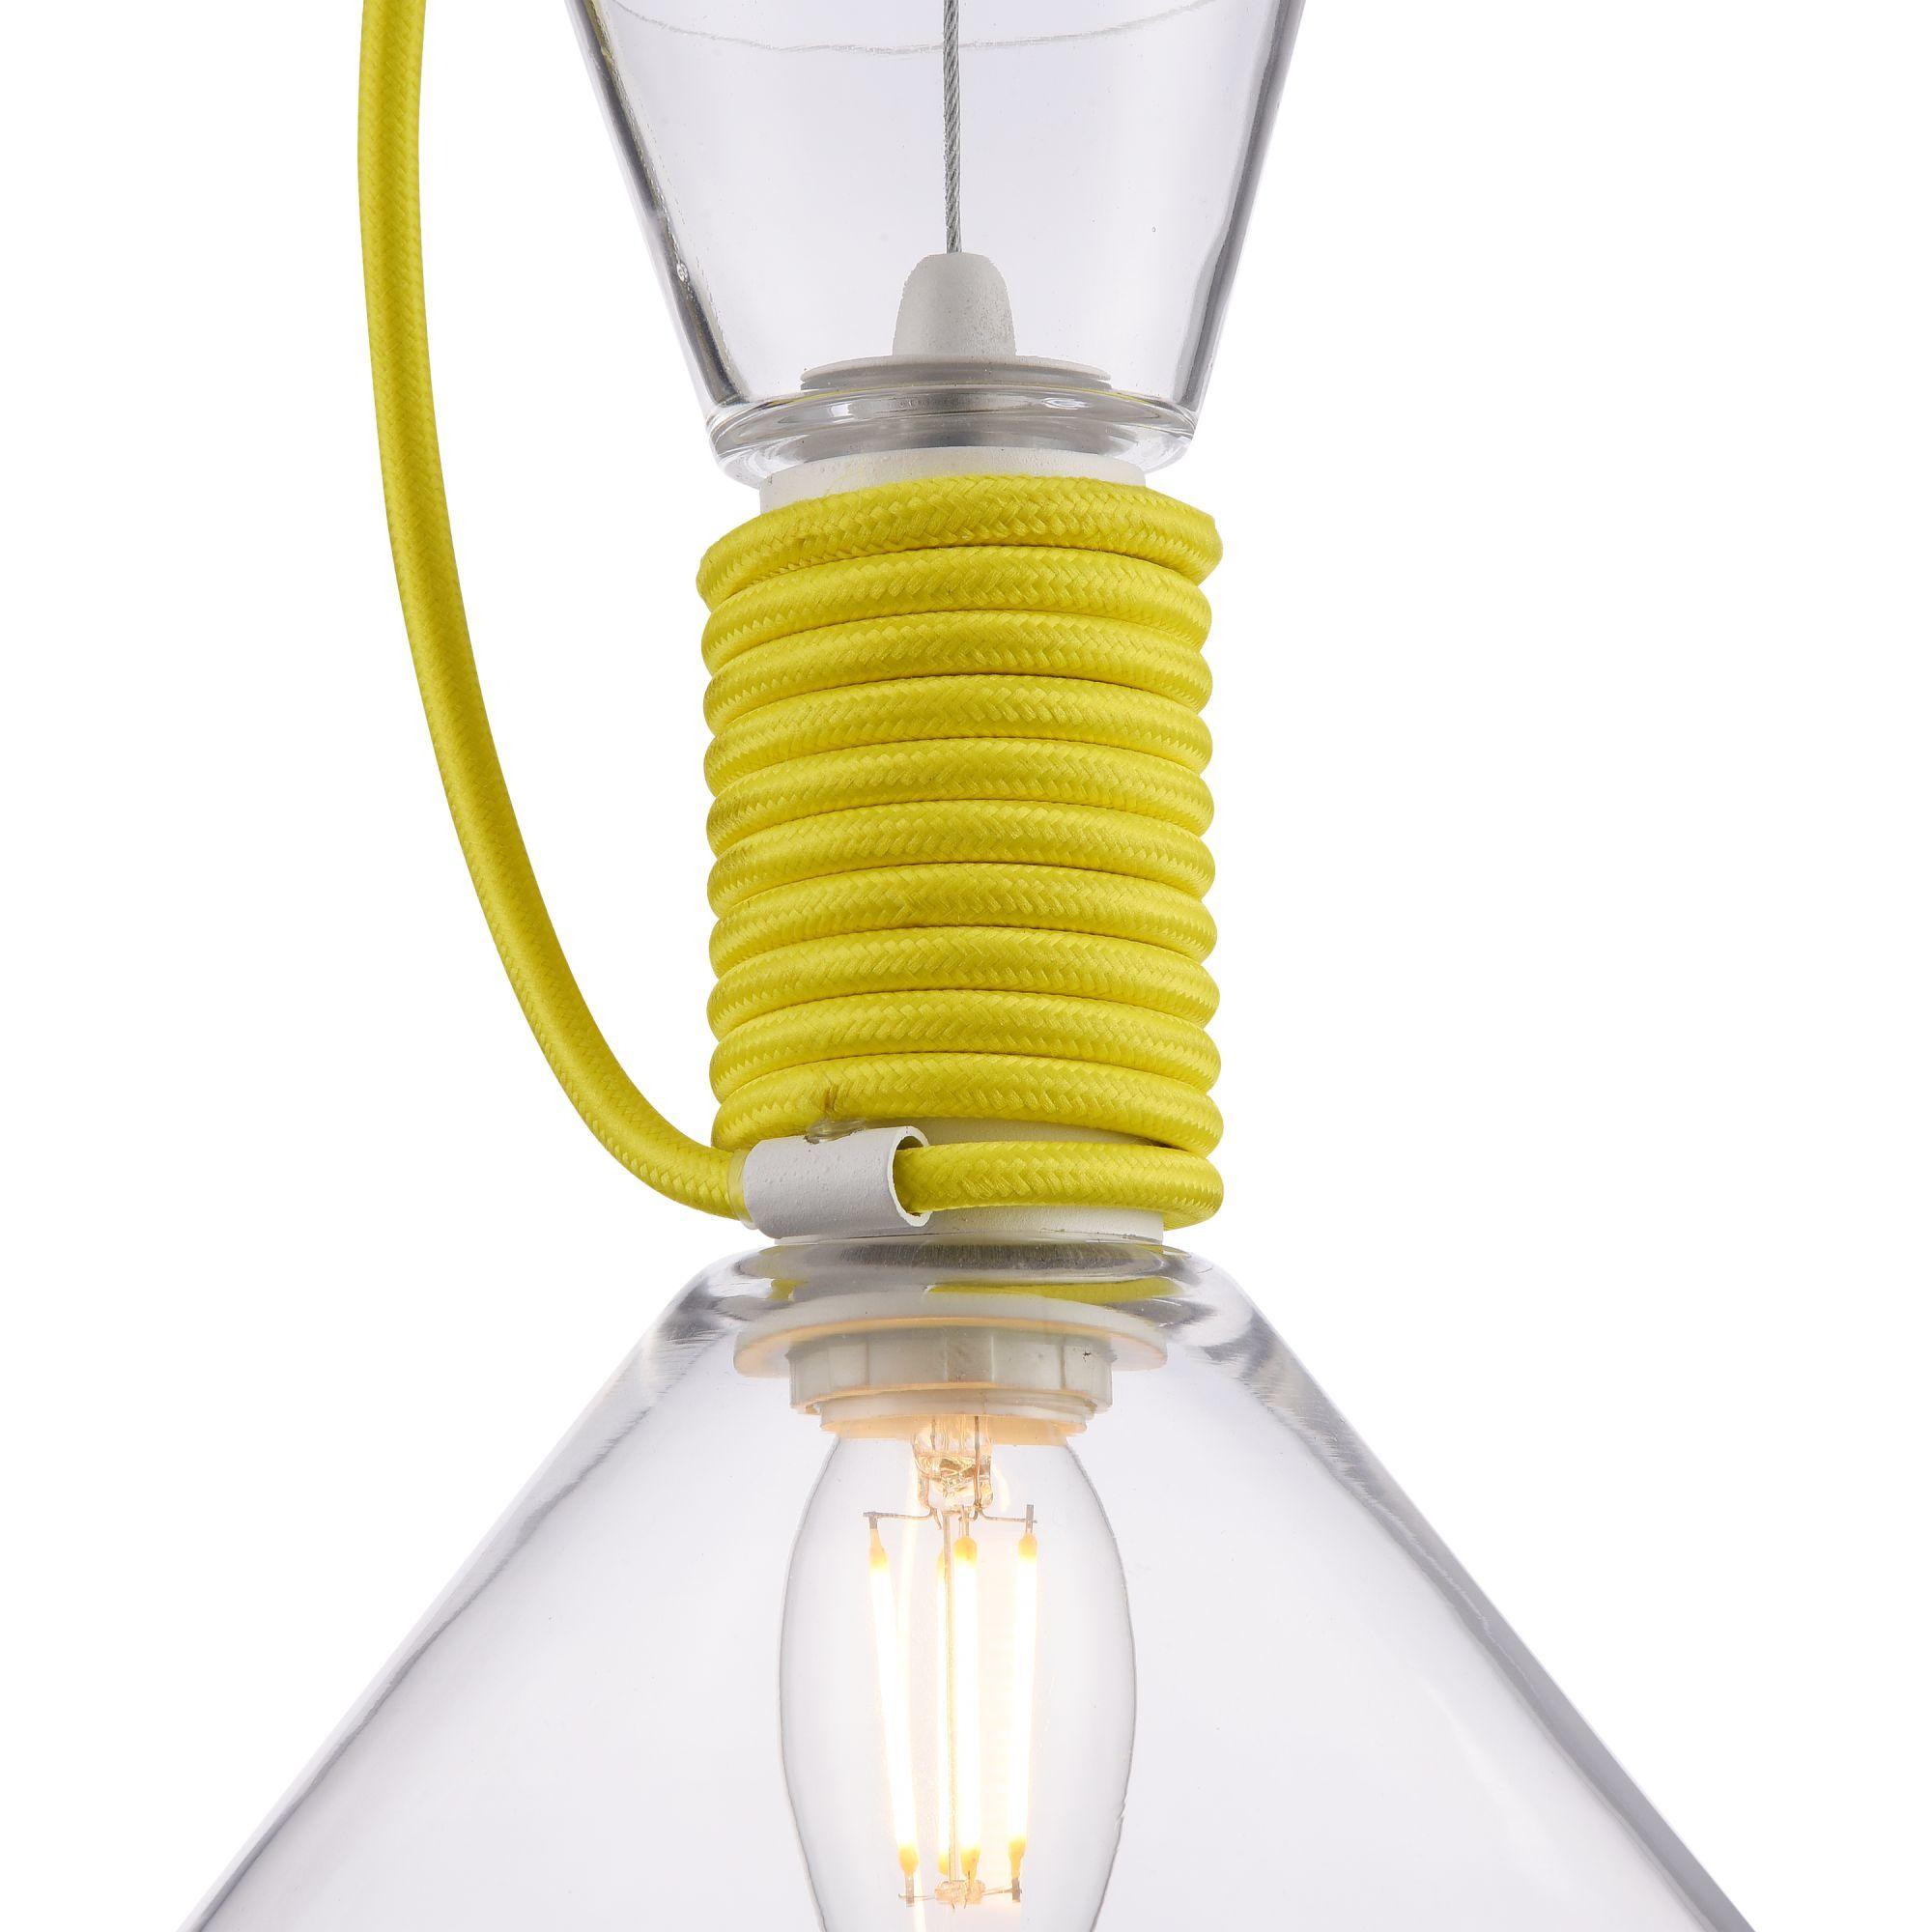 Подвесной светильник Maytoni Modern California P536PL-01YW, 1xE14x40W, белый, желтый, прозрачный, металл, стекло - фото 9